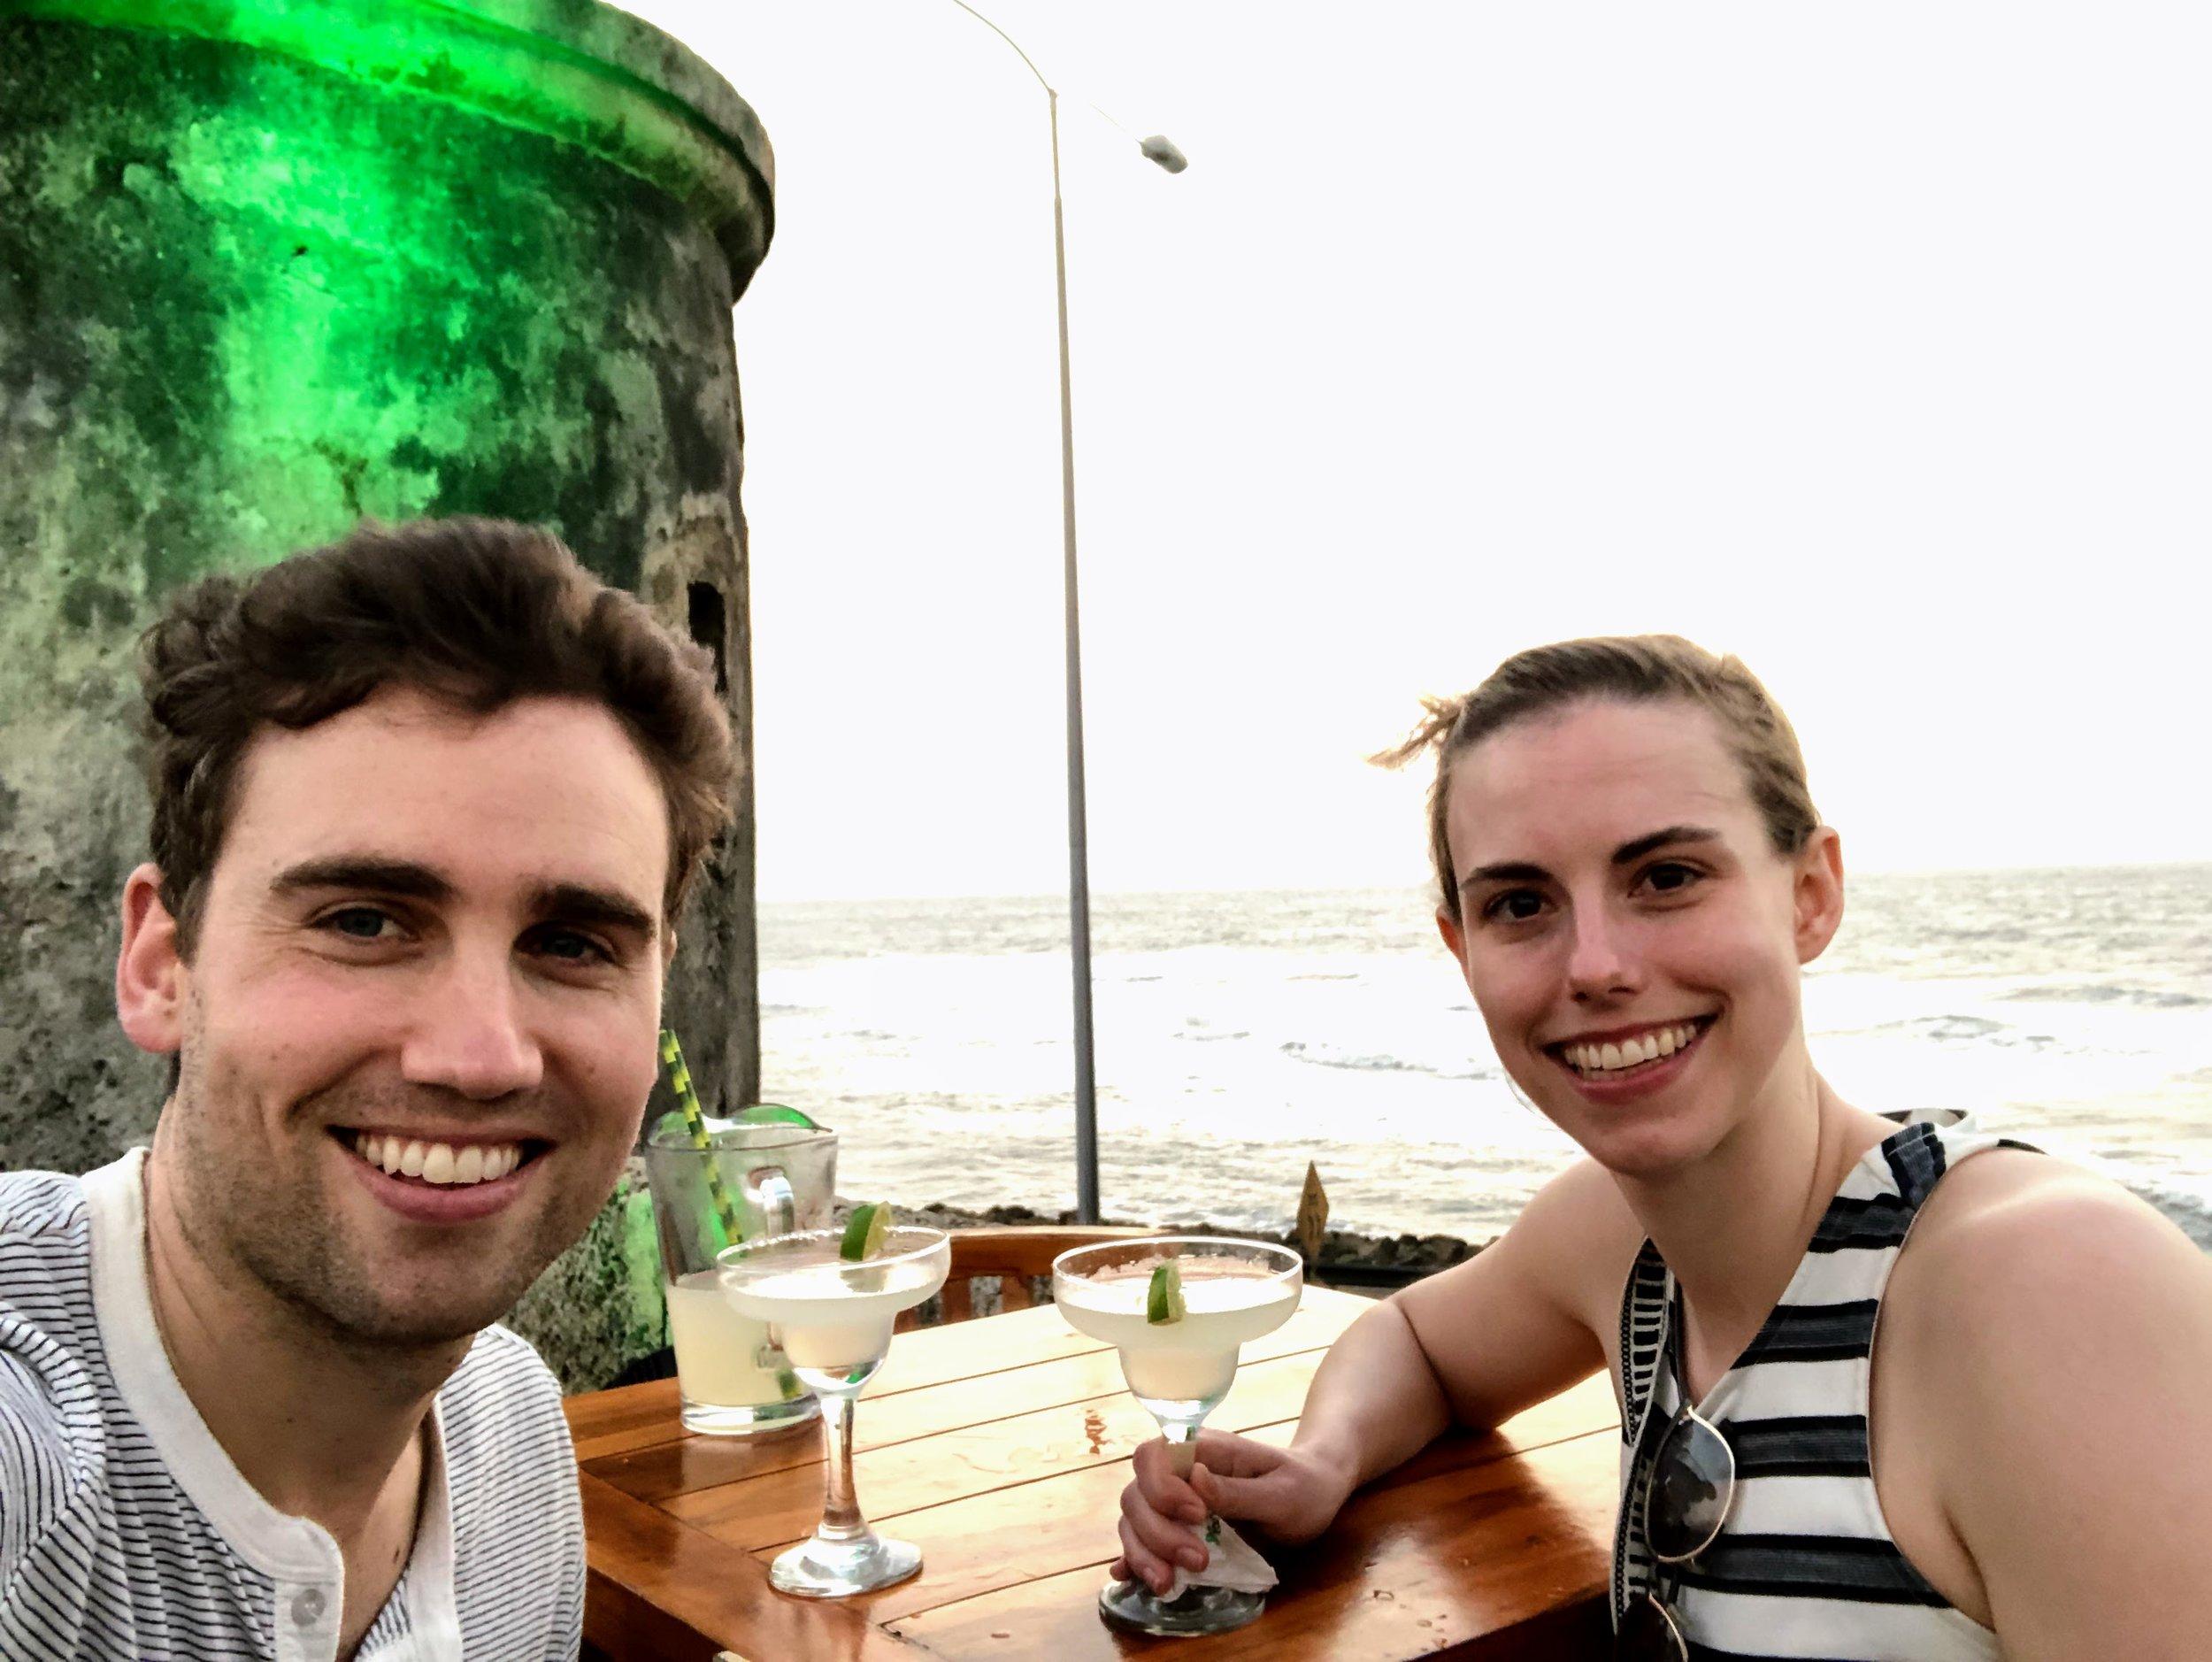 Bugs, margaritas and the ocean